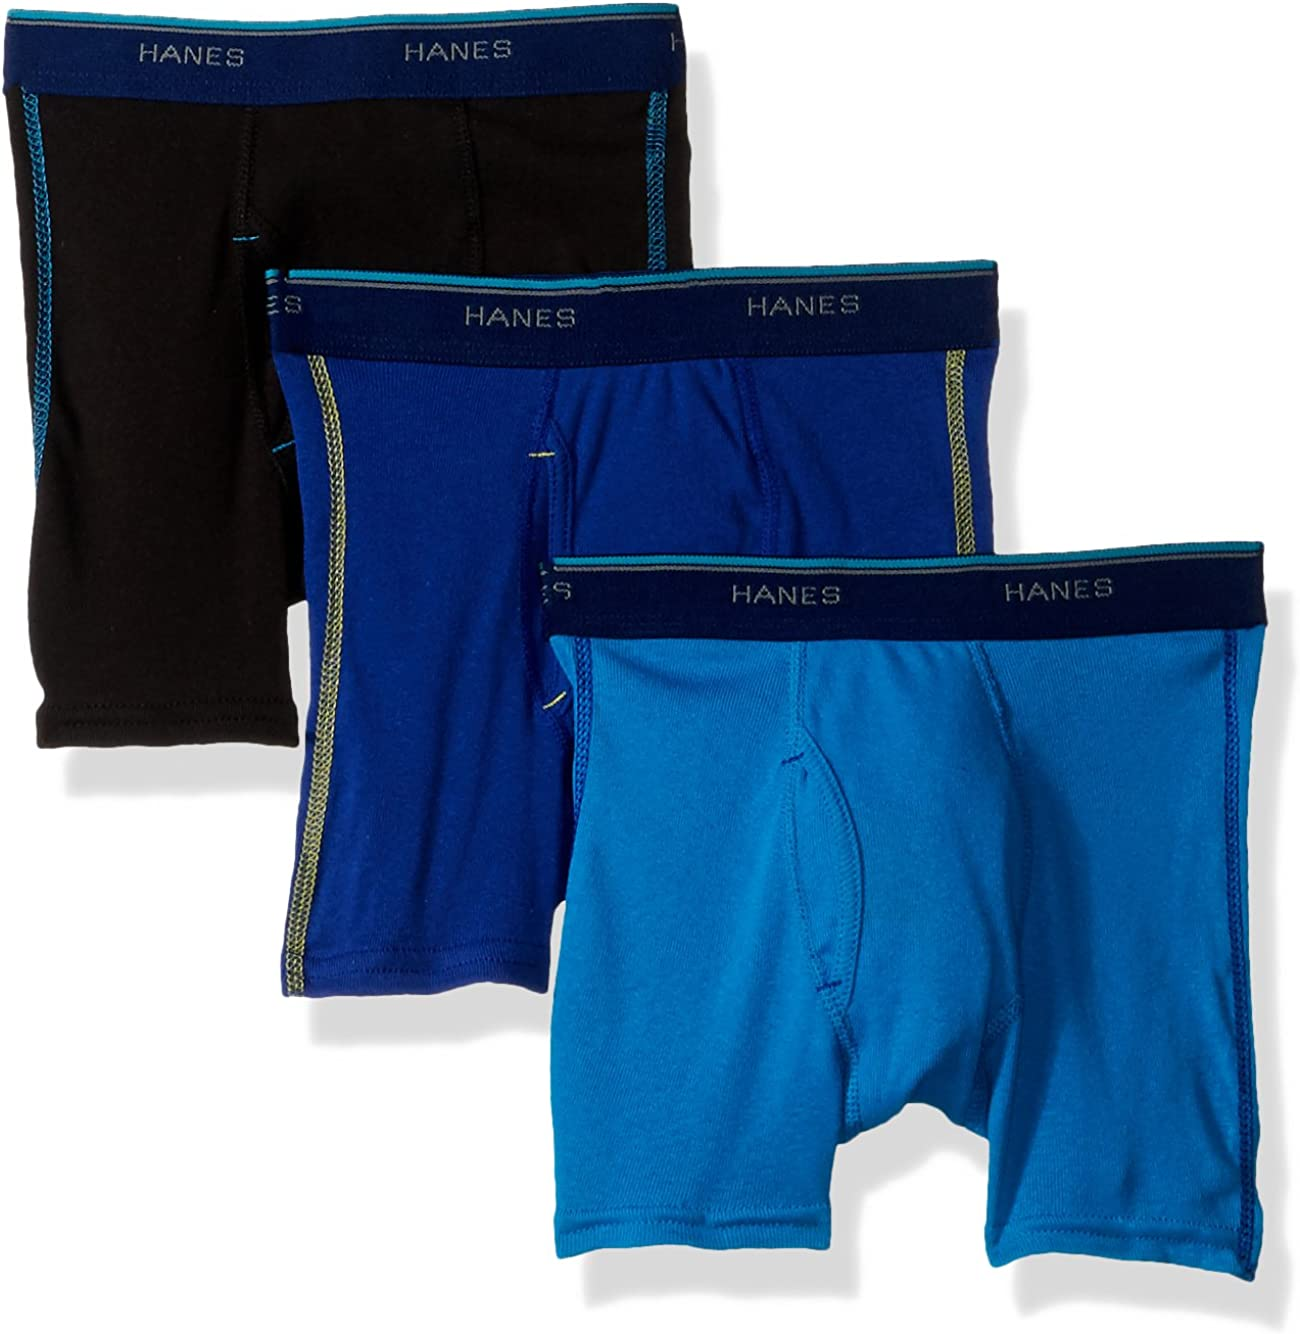 Hanes Boys' Red Label Comfort Flex Sport Inspired Boxer Briefs 3-Pack